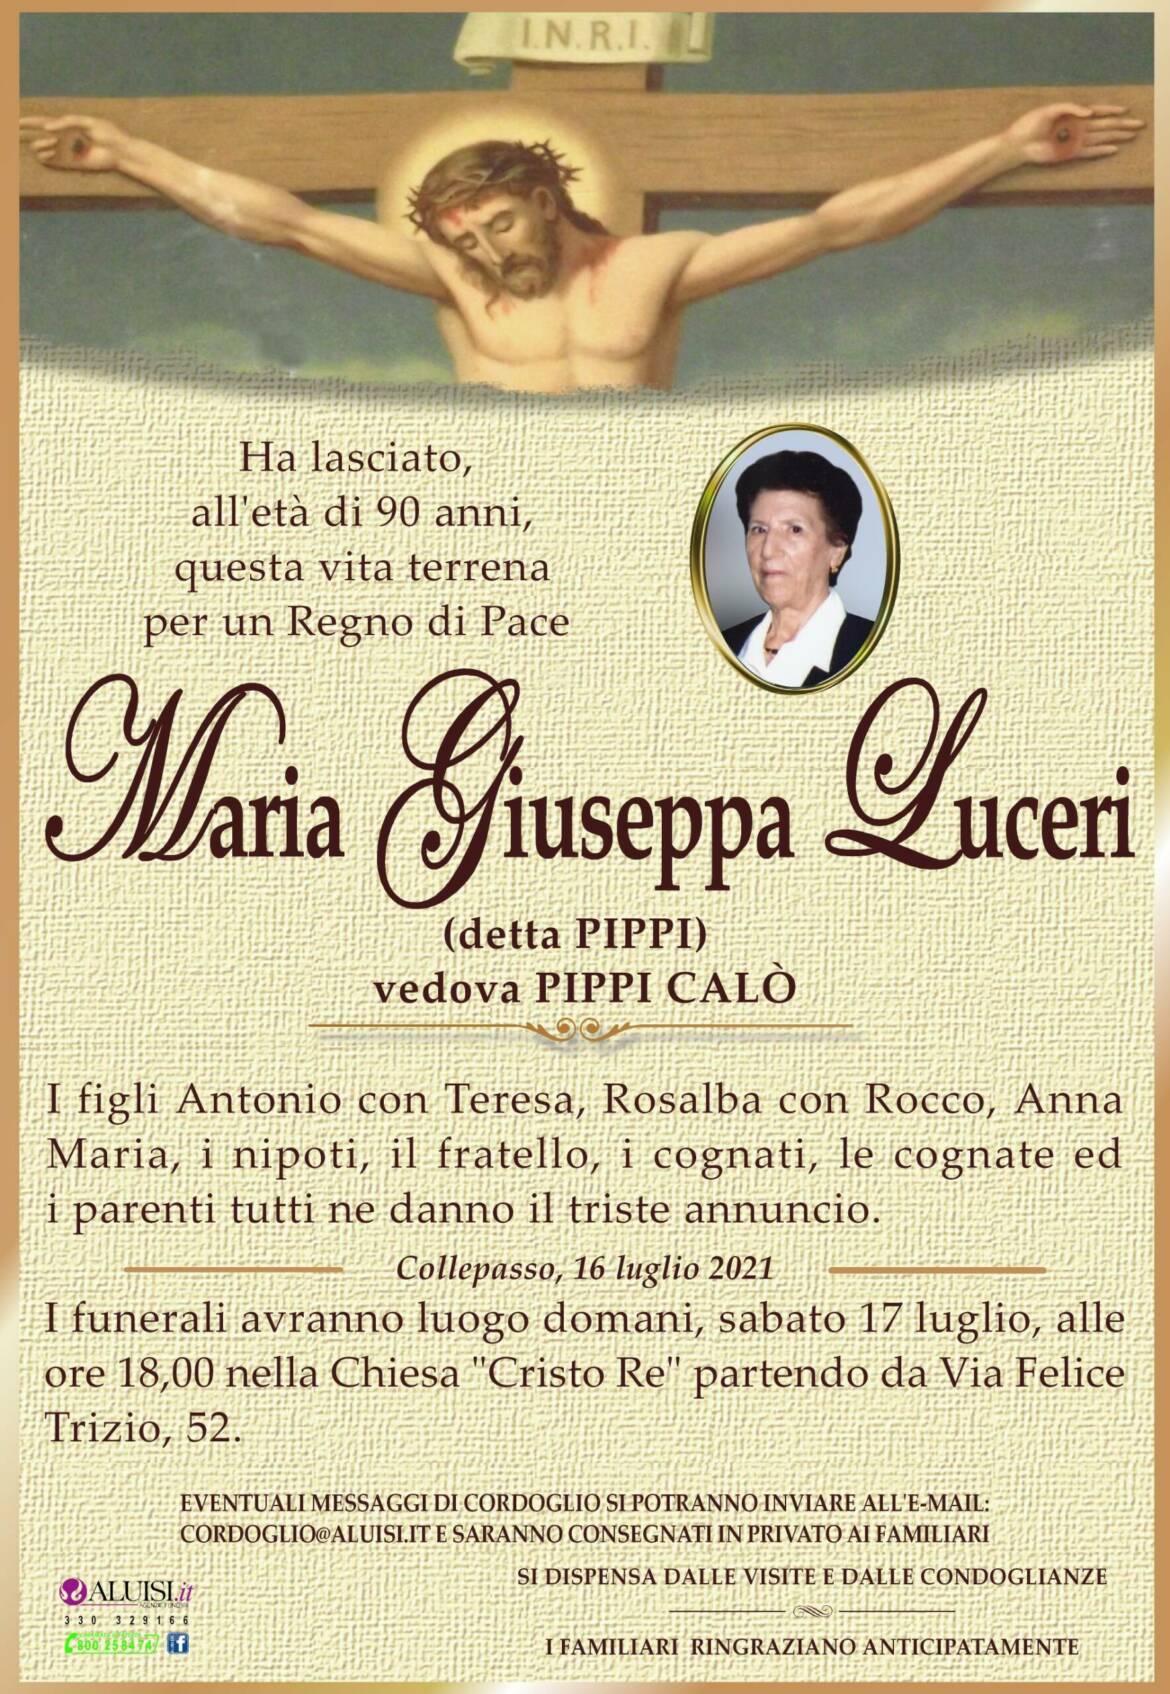 annuncio-MARIA-GIUSEPPA-LUCERI-COLLEPASSO-scaled.jpg